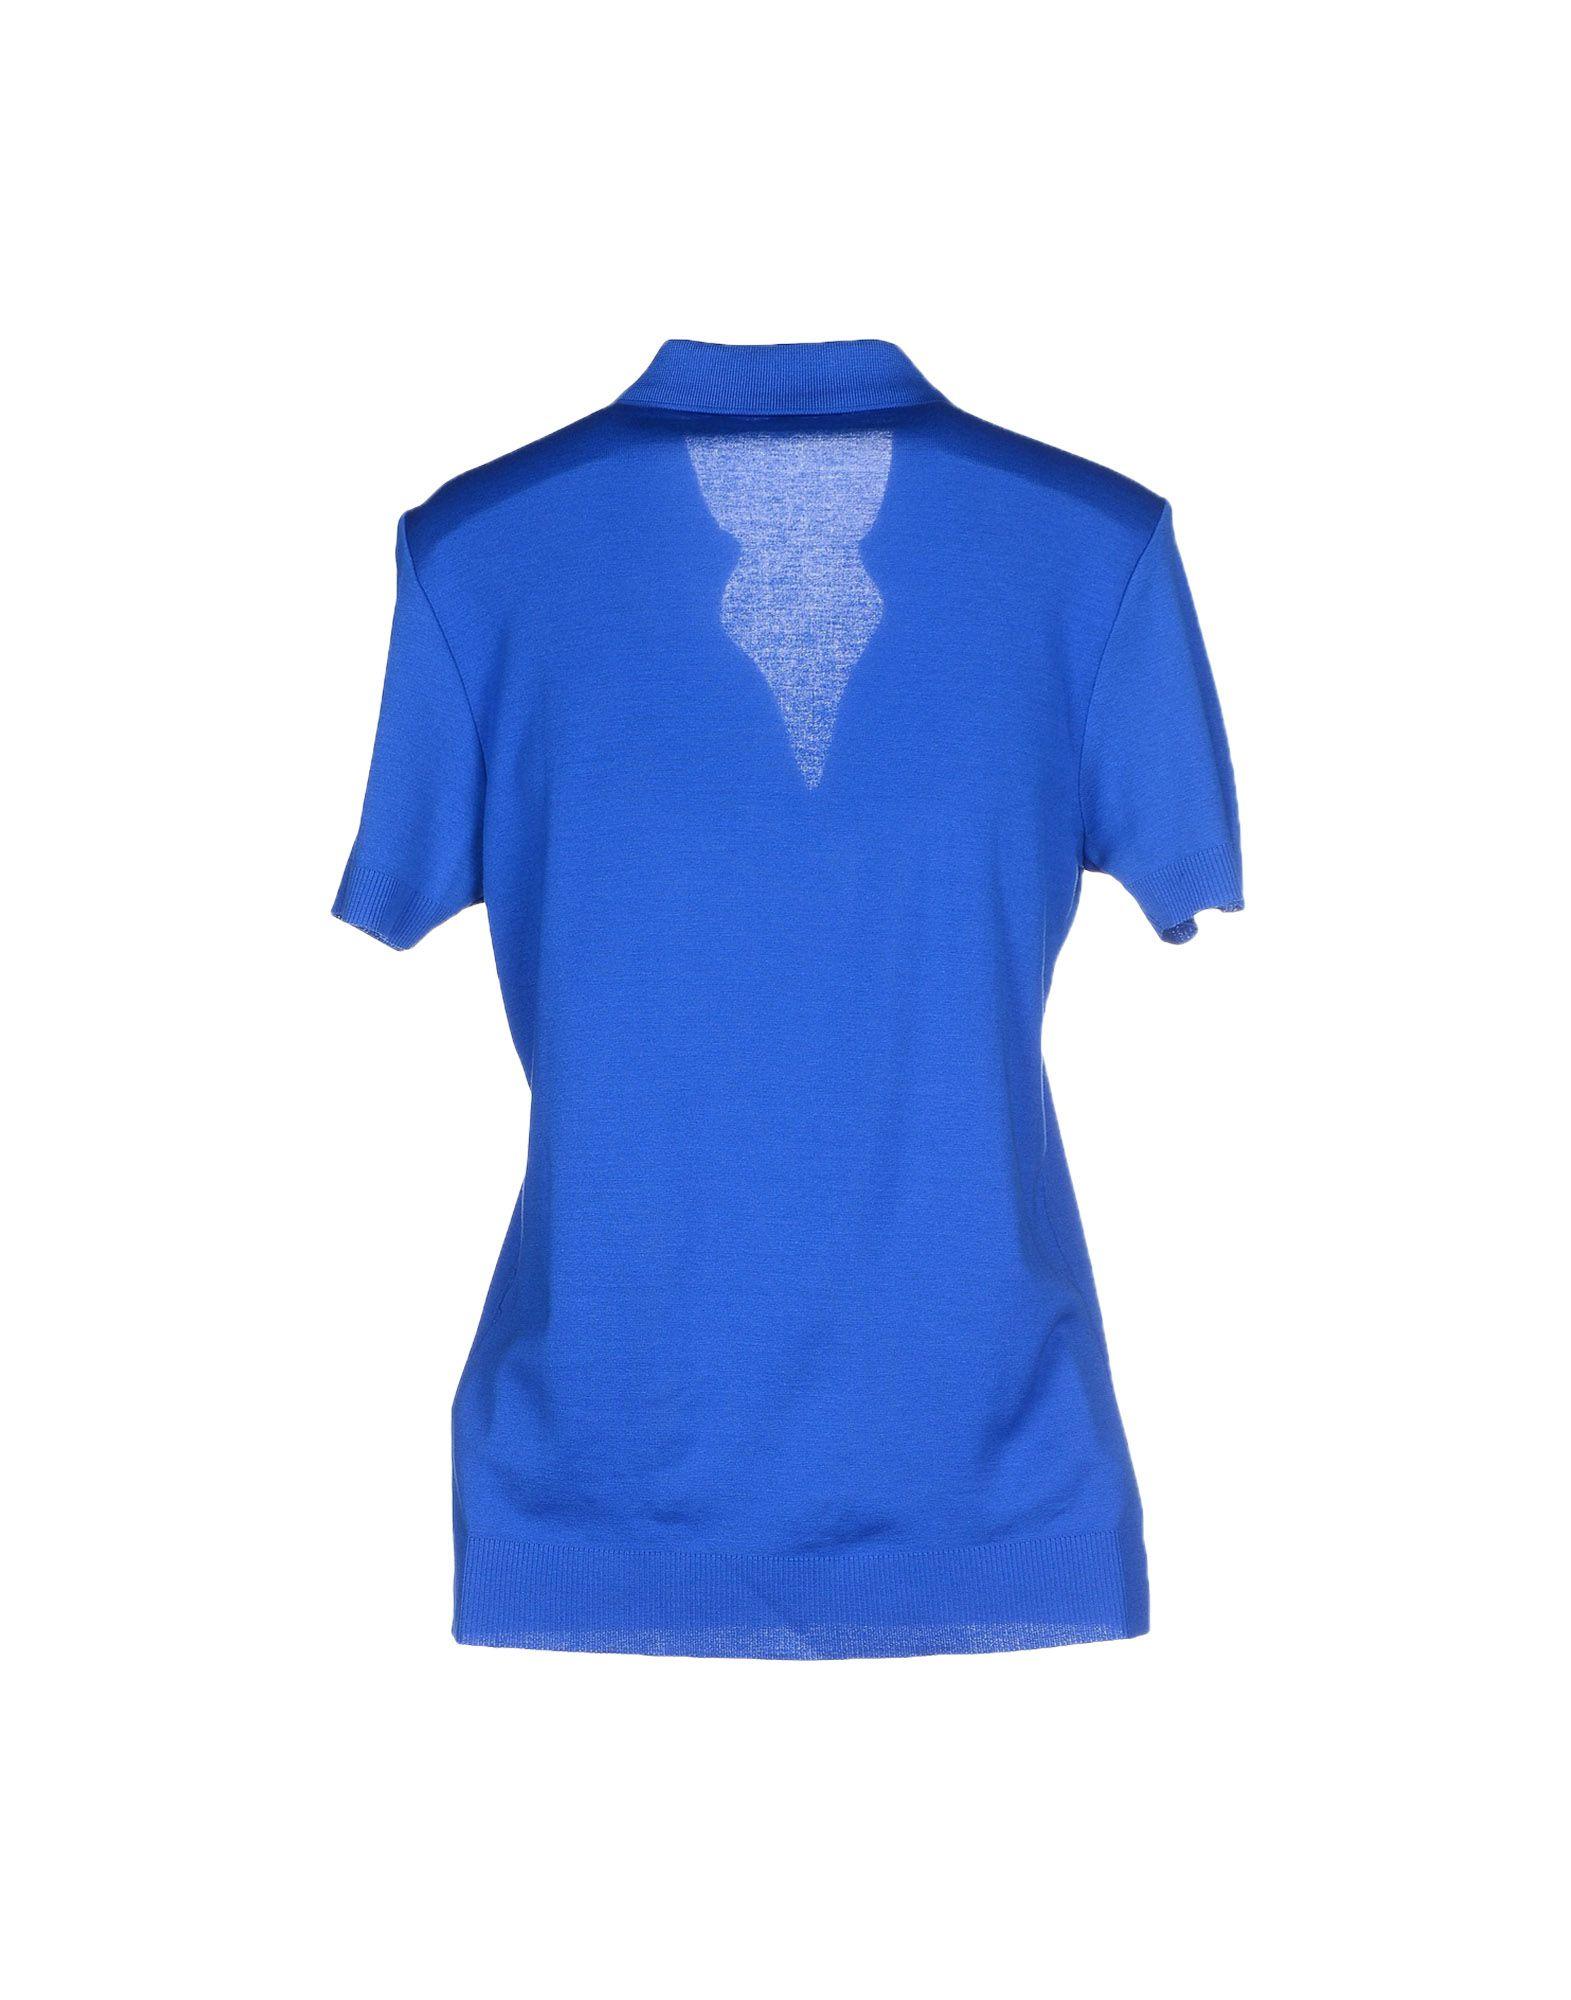 Lyst ralph lauren black label polo shirt in blue for Ralph lauren black label polo shirt